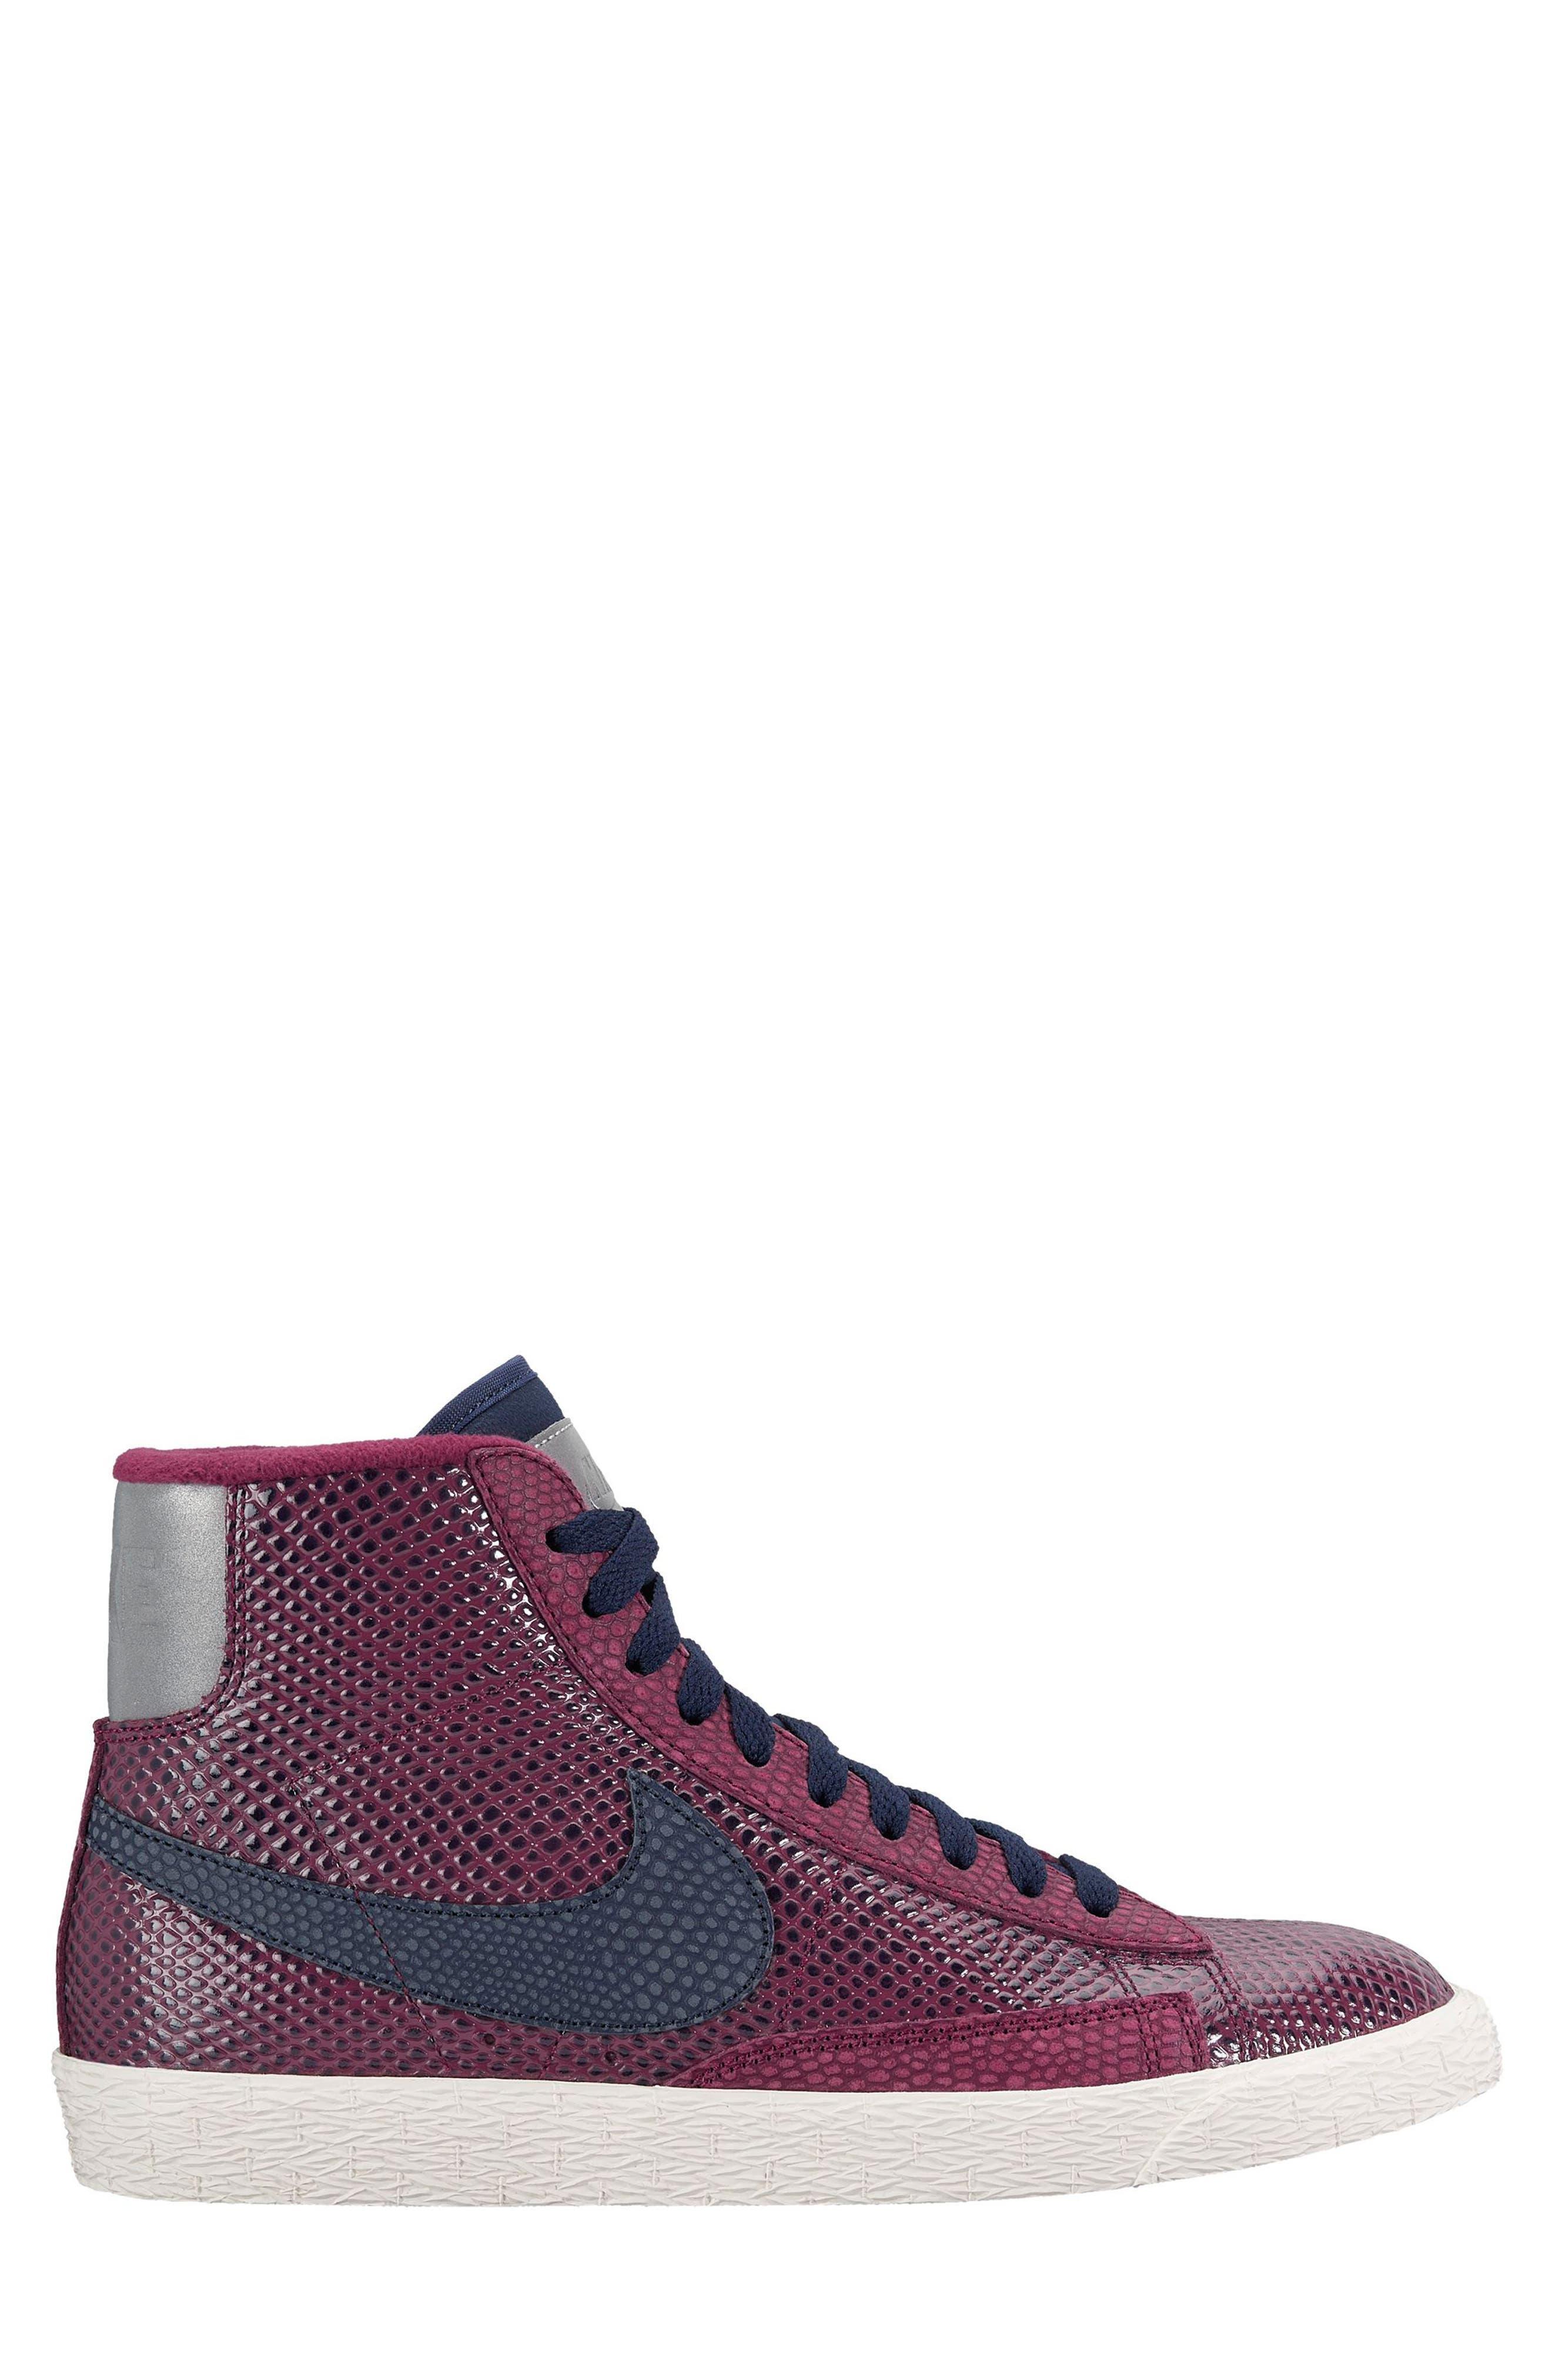 Alternate Image 1 Selected - Nike Blazer Mid Top Sneaker (Women)